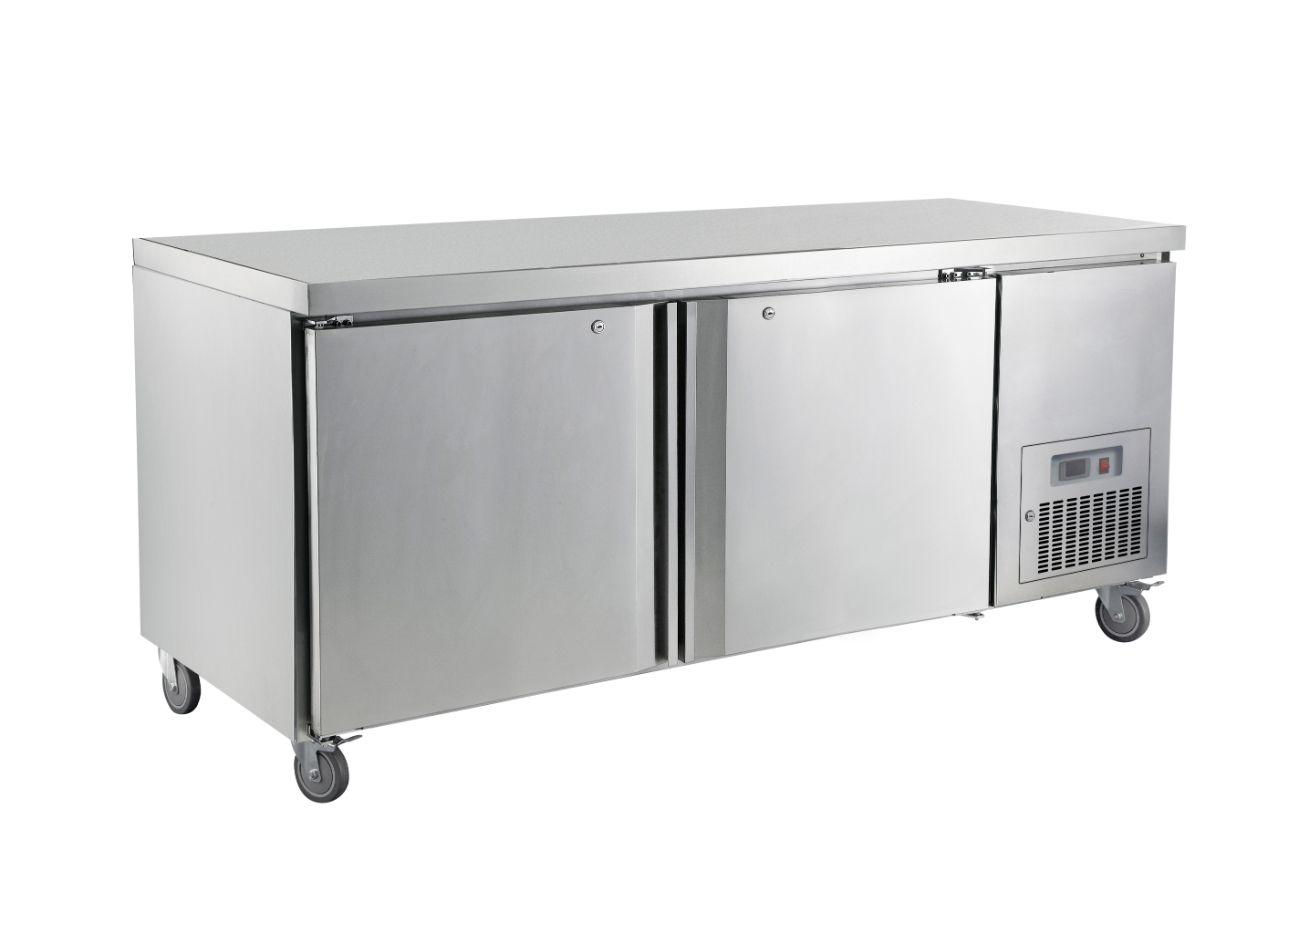 Saltas CUS1800 Undercounter Refrigerator